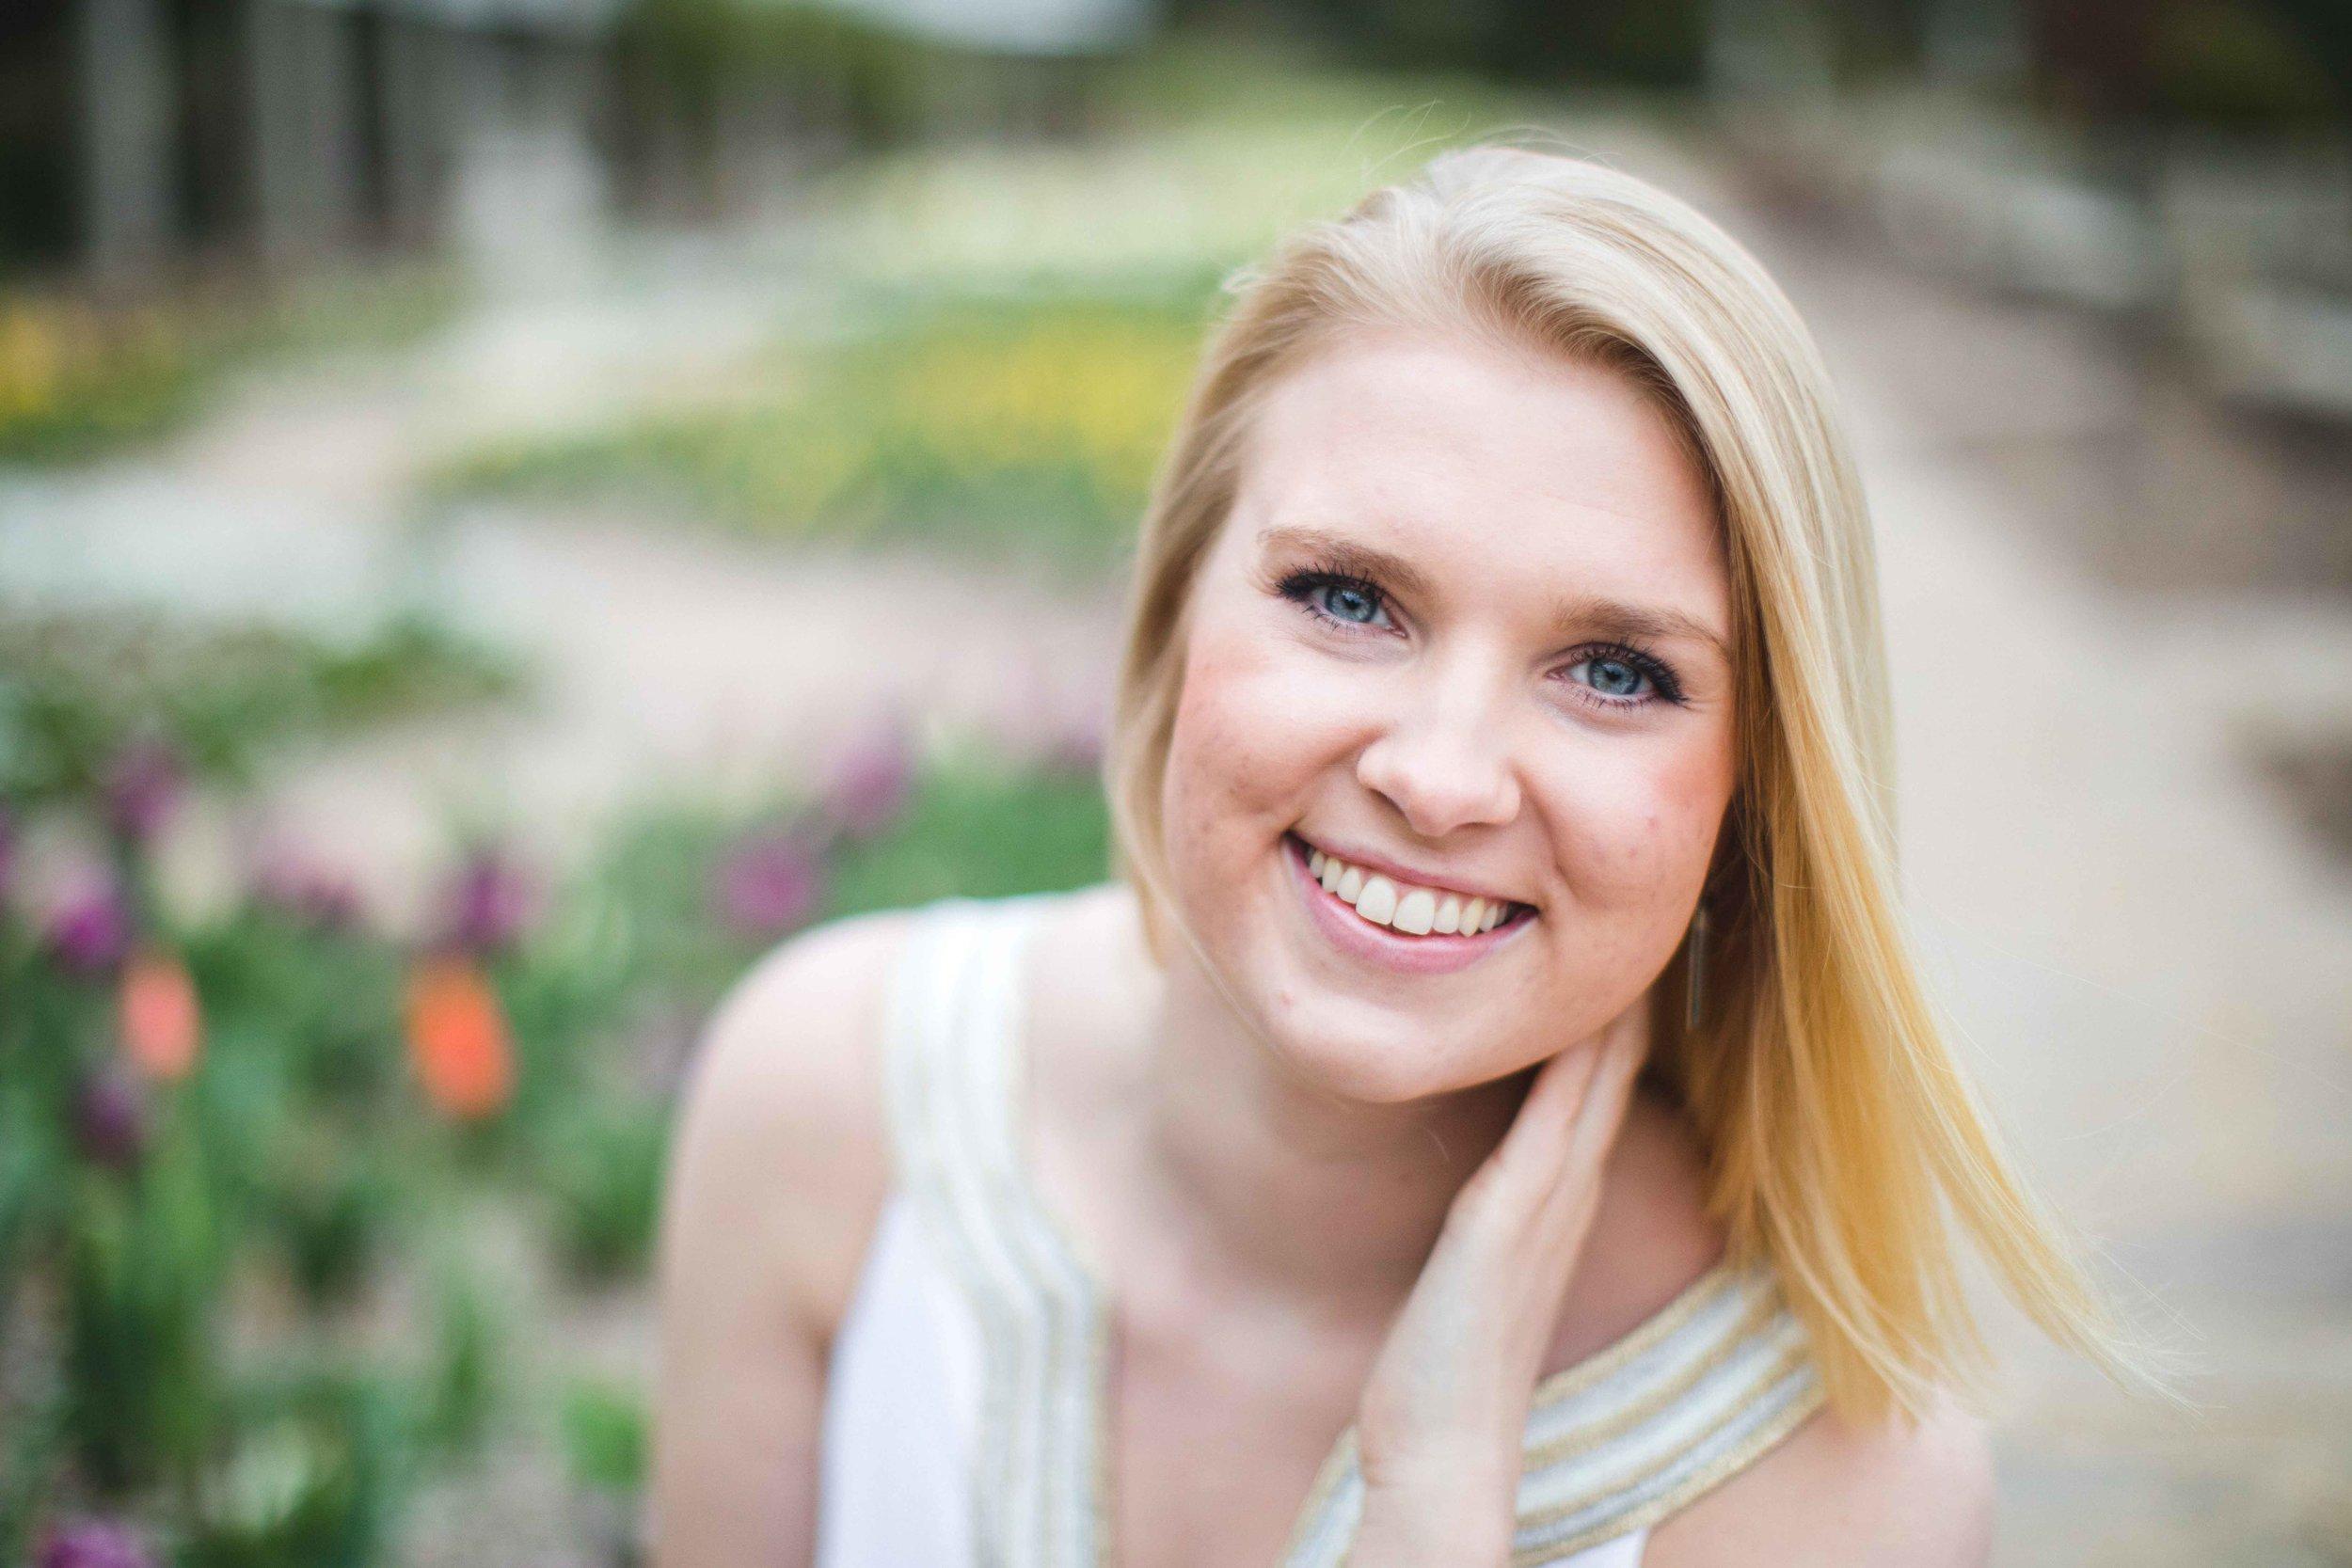 maymont-richmond-senior-portraits-vcu-graduation-richmond-wedding-photographer-8.jpg